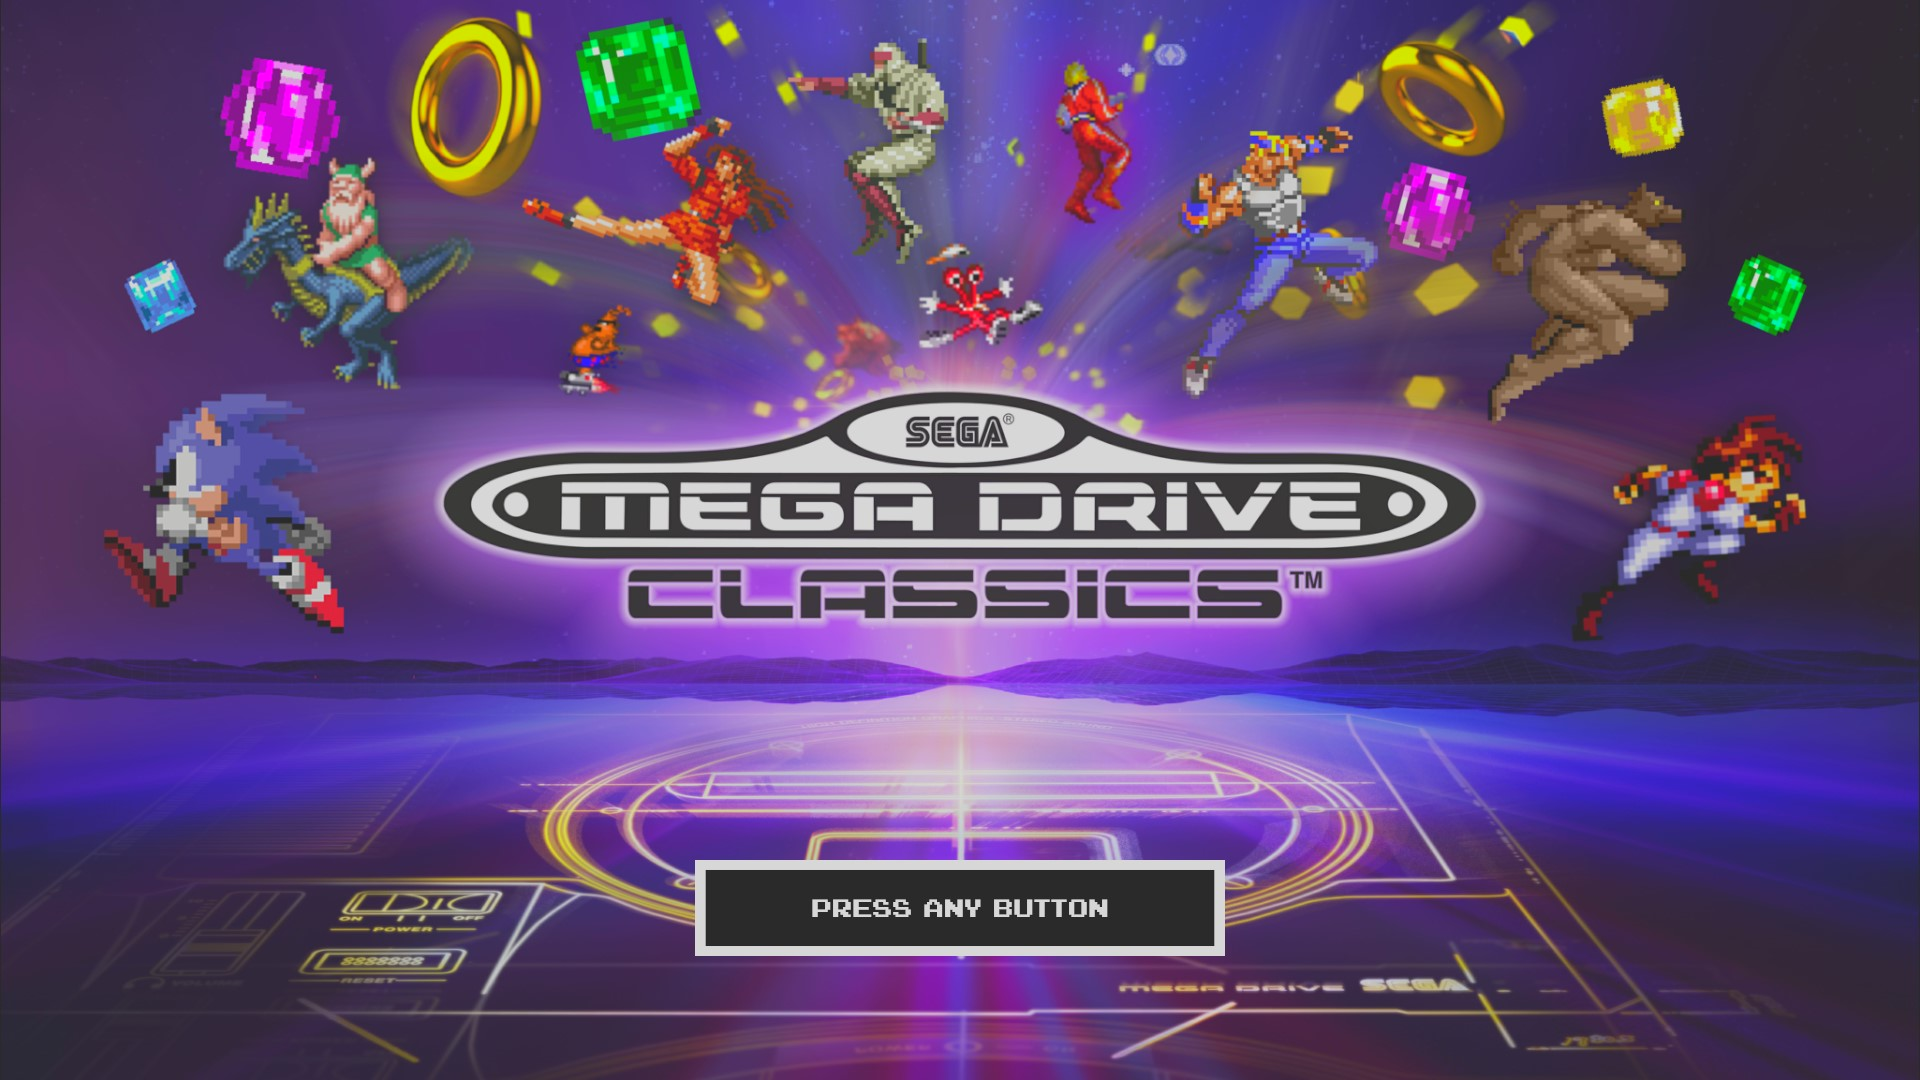 AkinNahtanoj: SEGA Genesis/Mega Drive Classics Volume 2: Alex Kidd In The Enchanted Castle (PC) 590 points on 2020-08-18 15:27:49